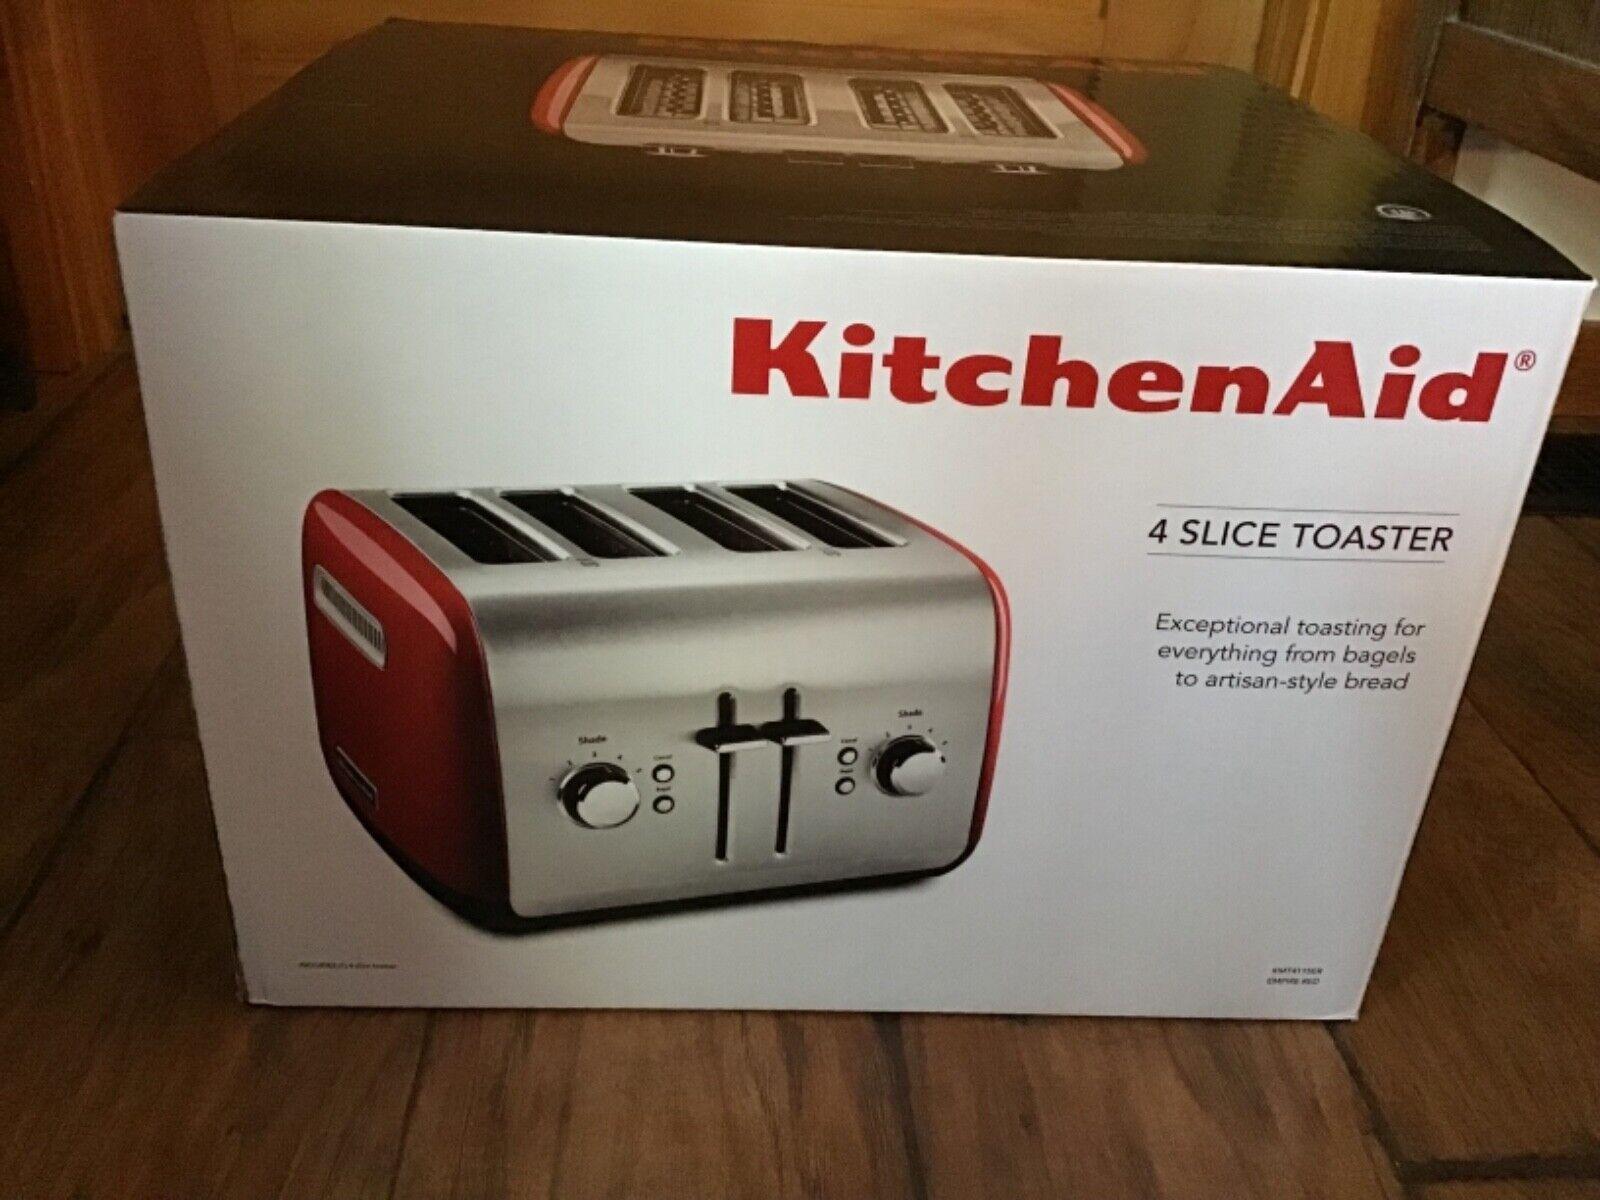 NEW KitchenAid 4-Slice Toaster KMT4115ER